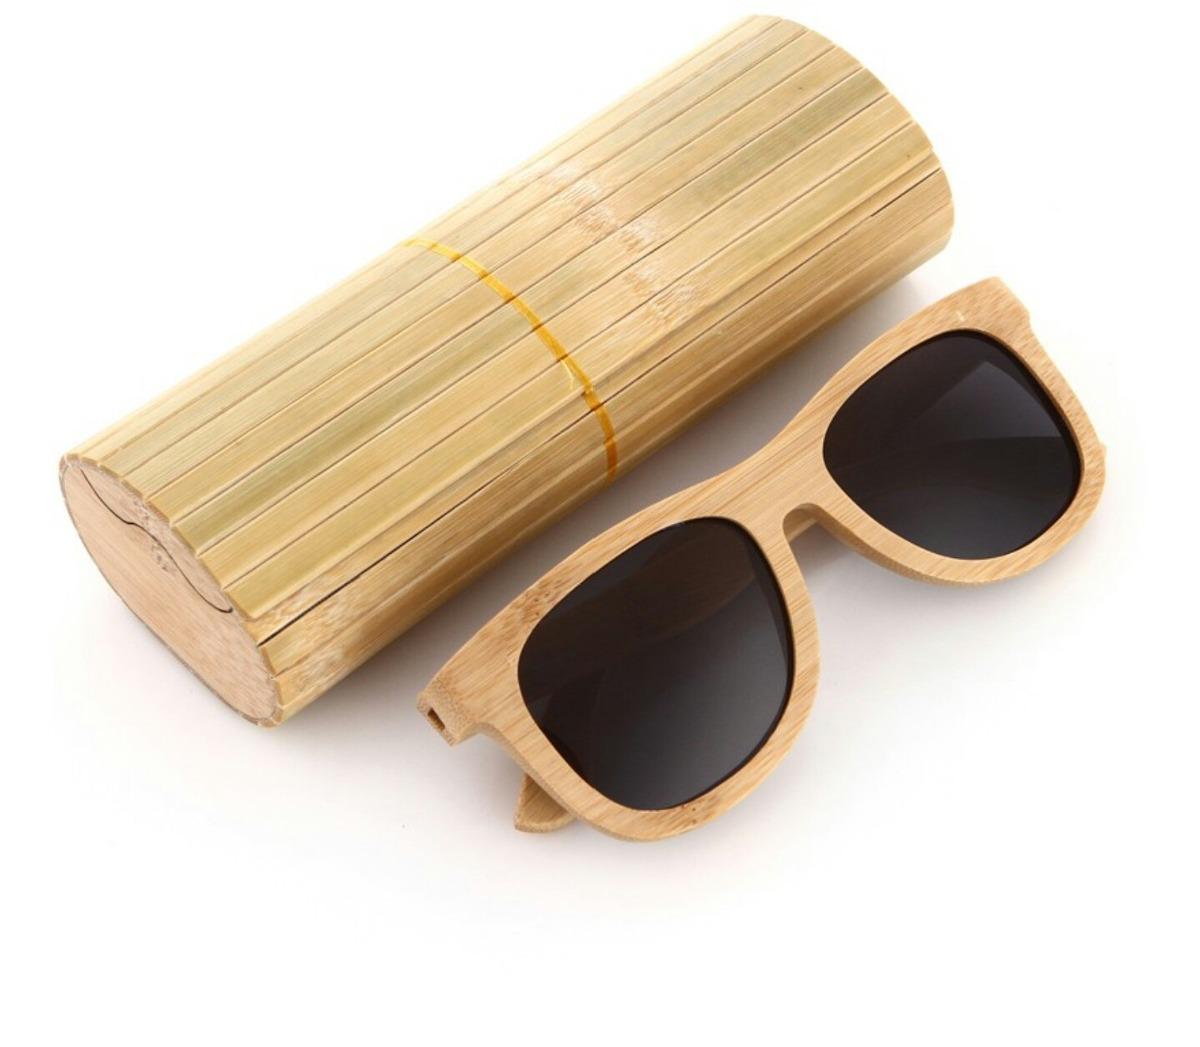 573860965 oculos de sol madeira amadeirado bambu natural polarizado. Carregando zoom.